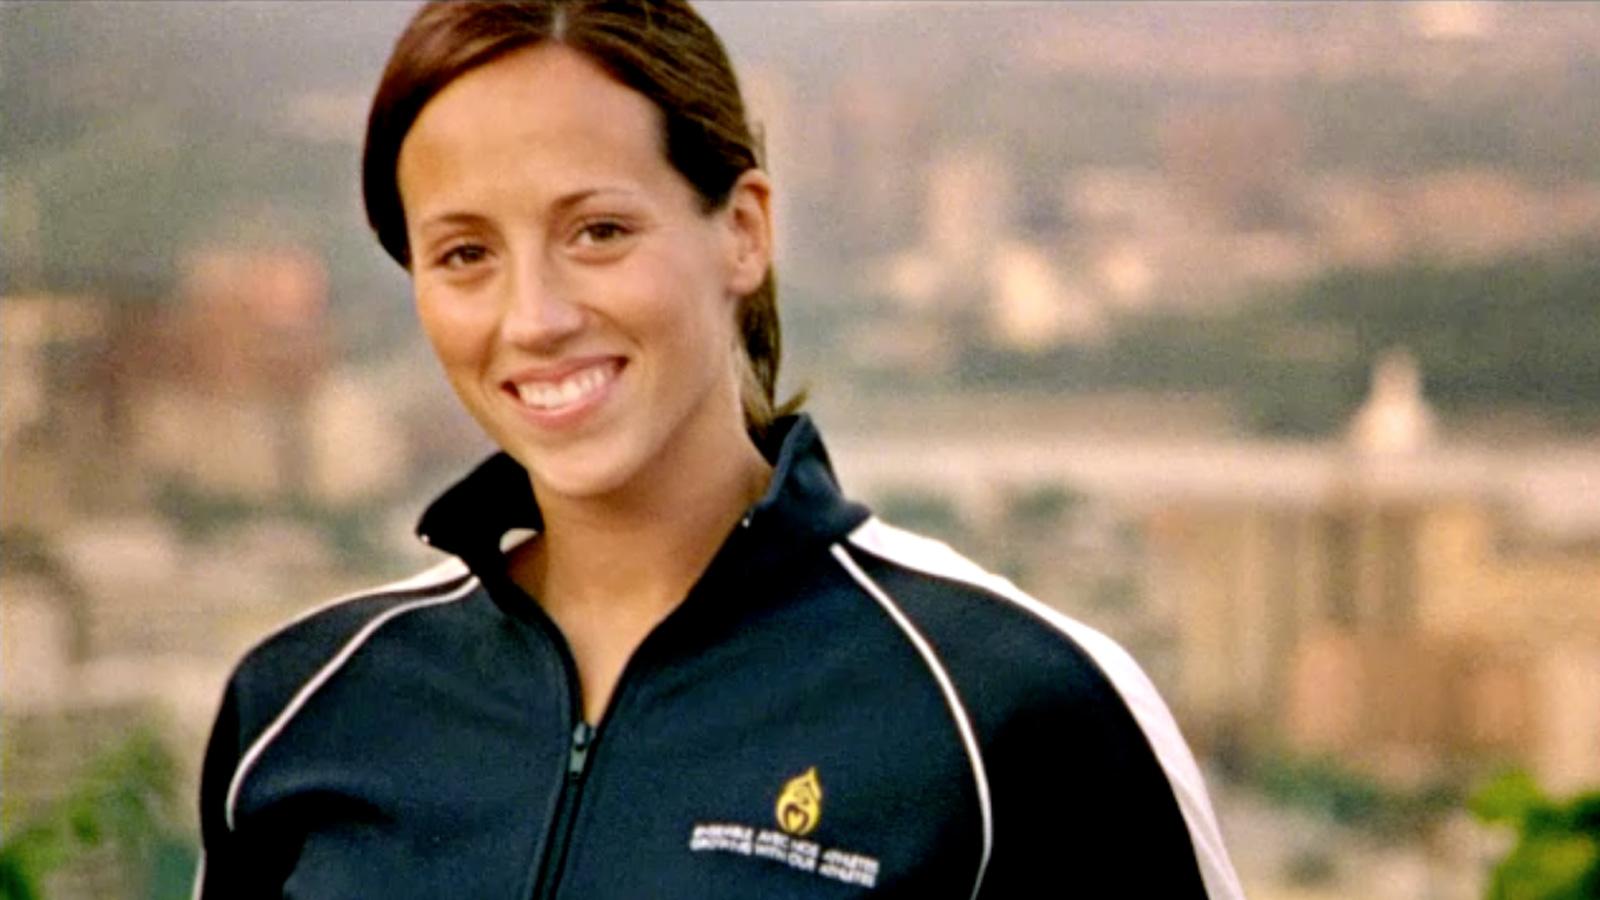 RONA | Olympics Sponsorship |